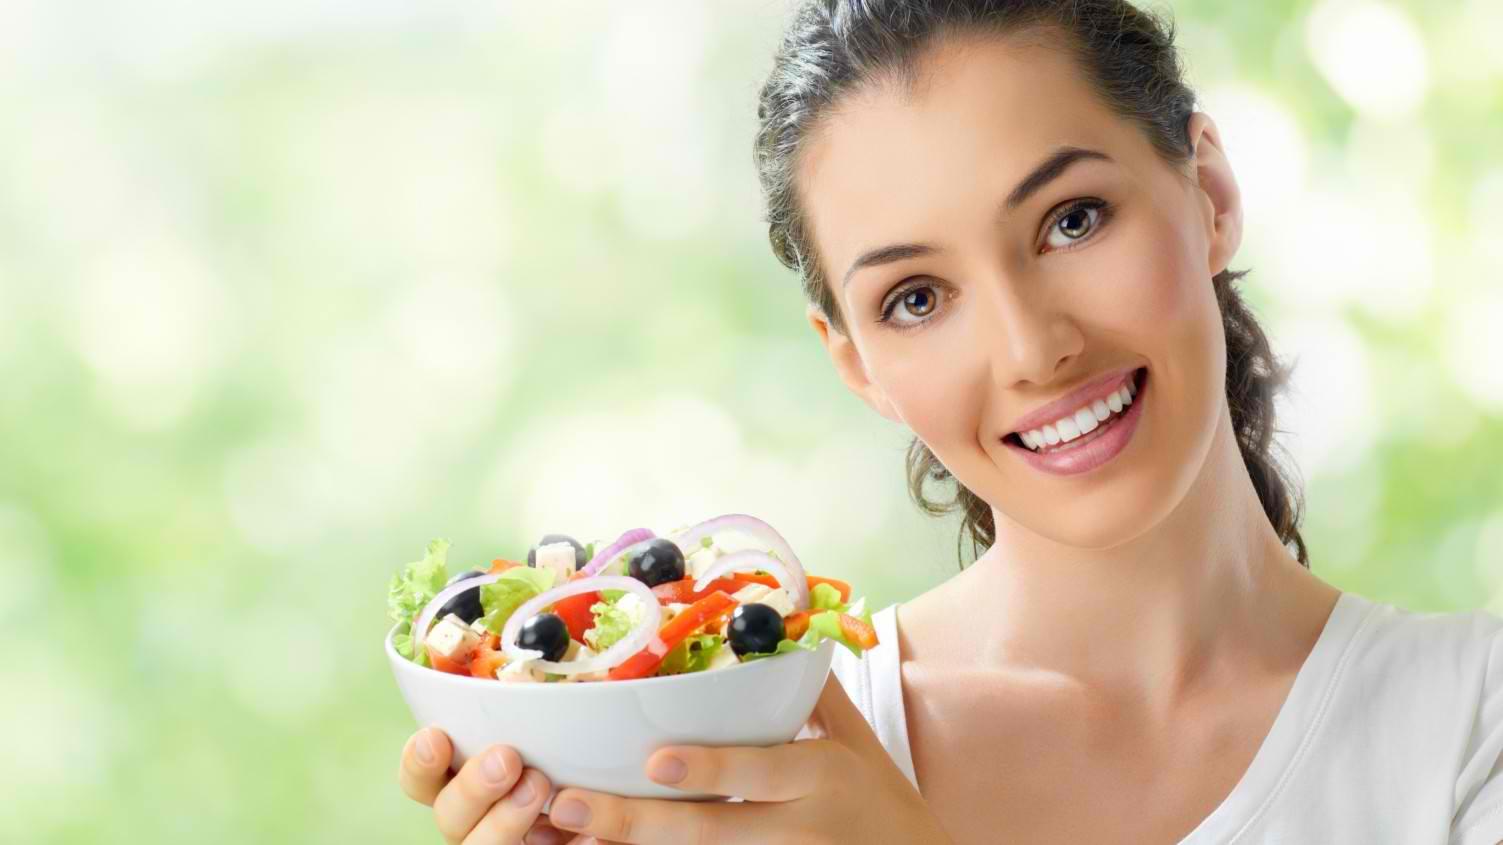 CONSILIERE NUTRITIE/DIETA